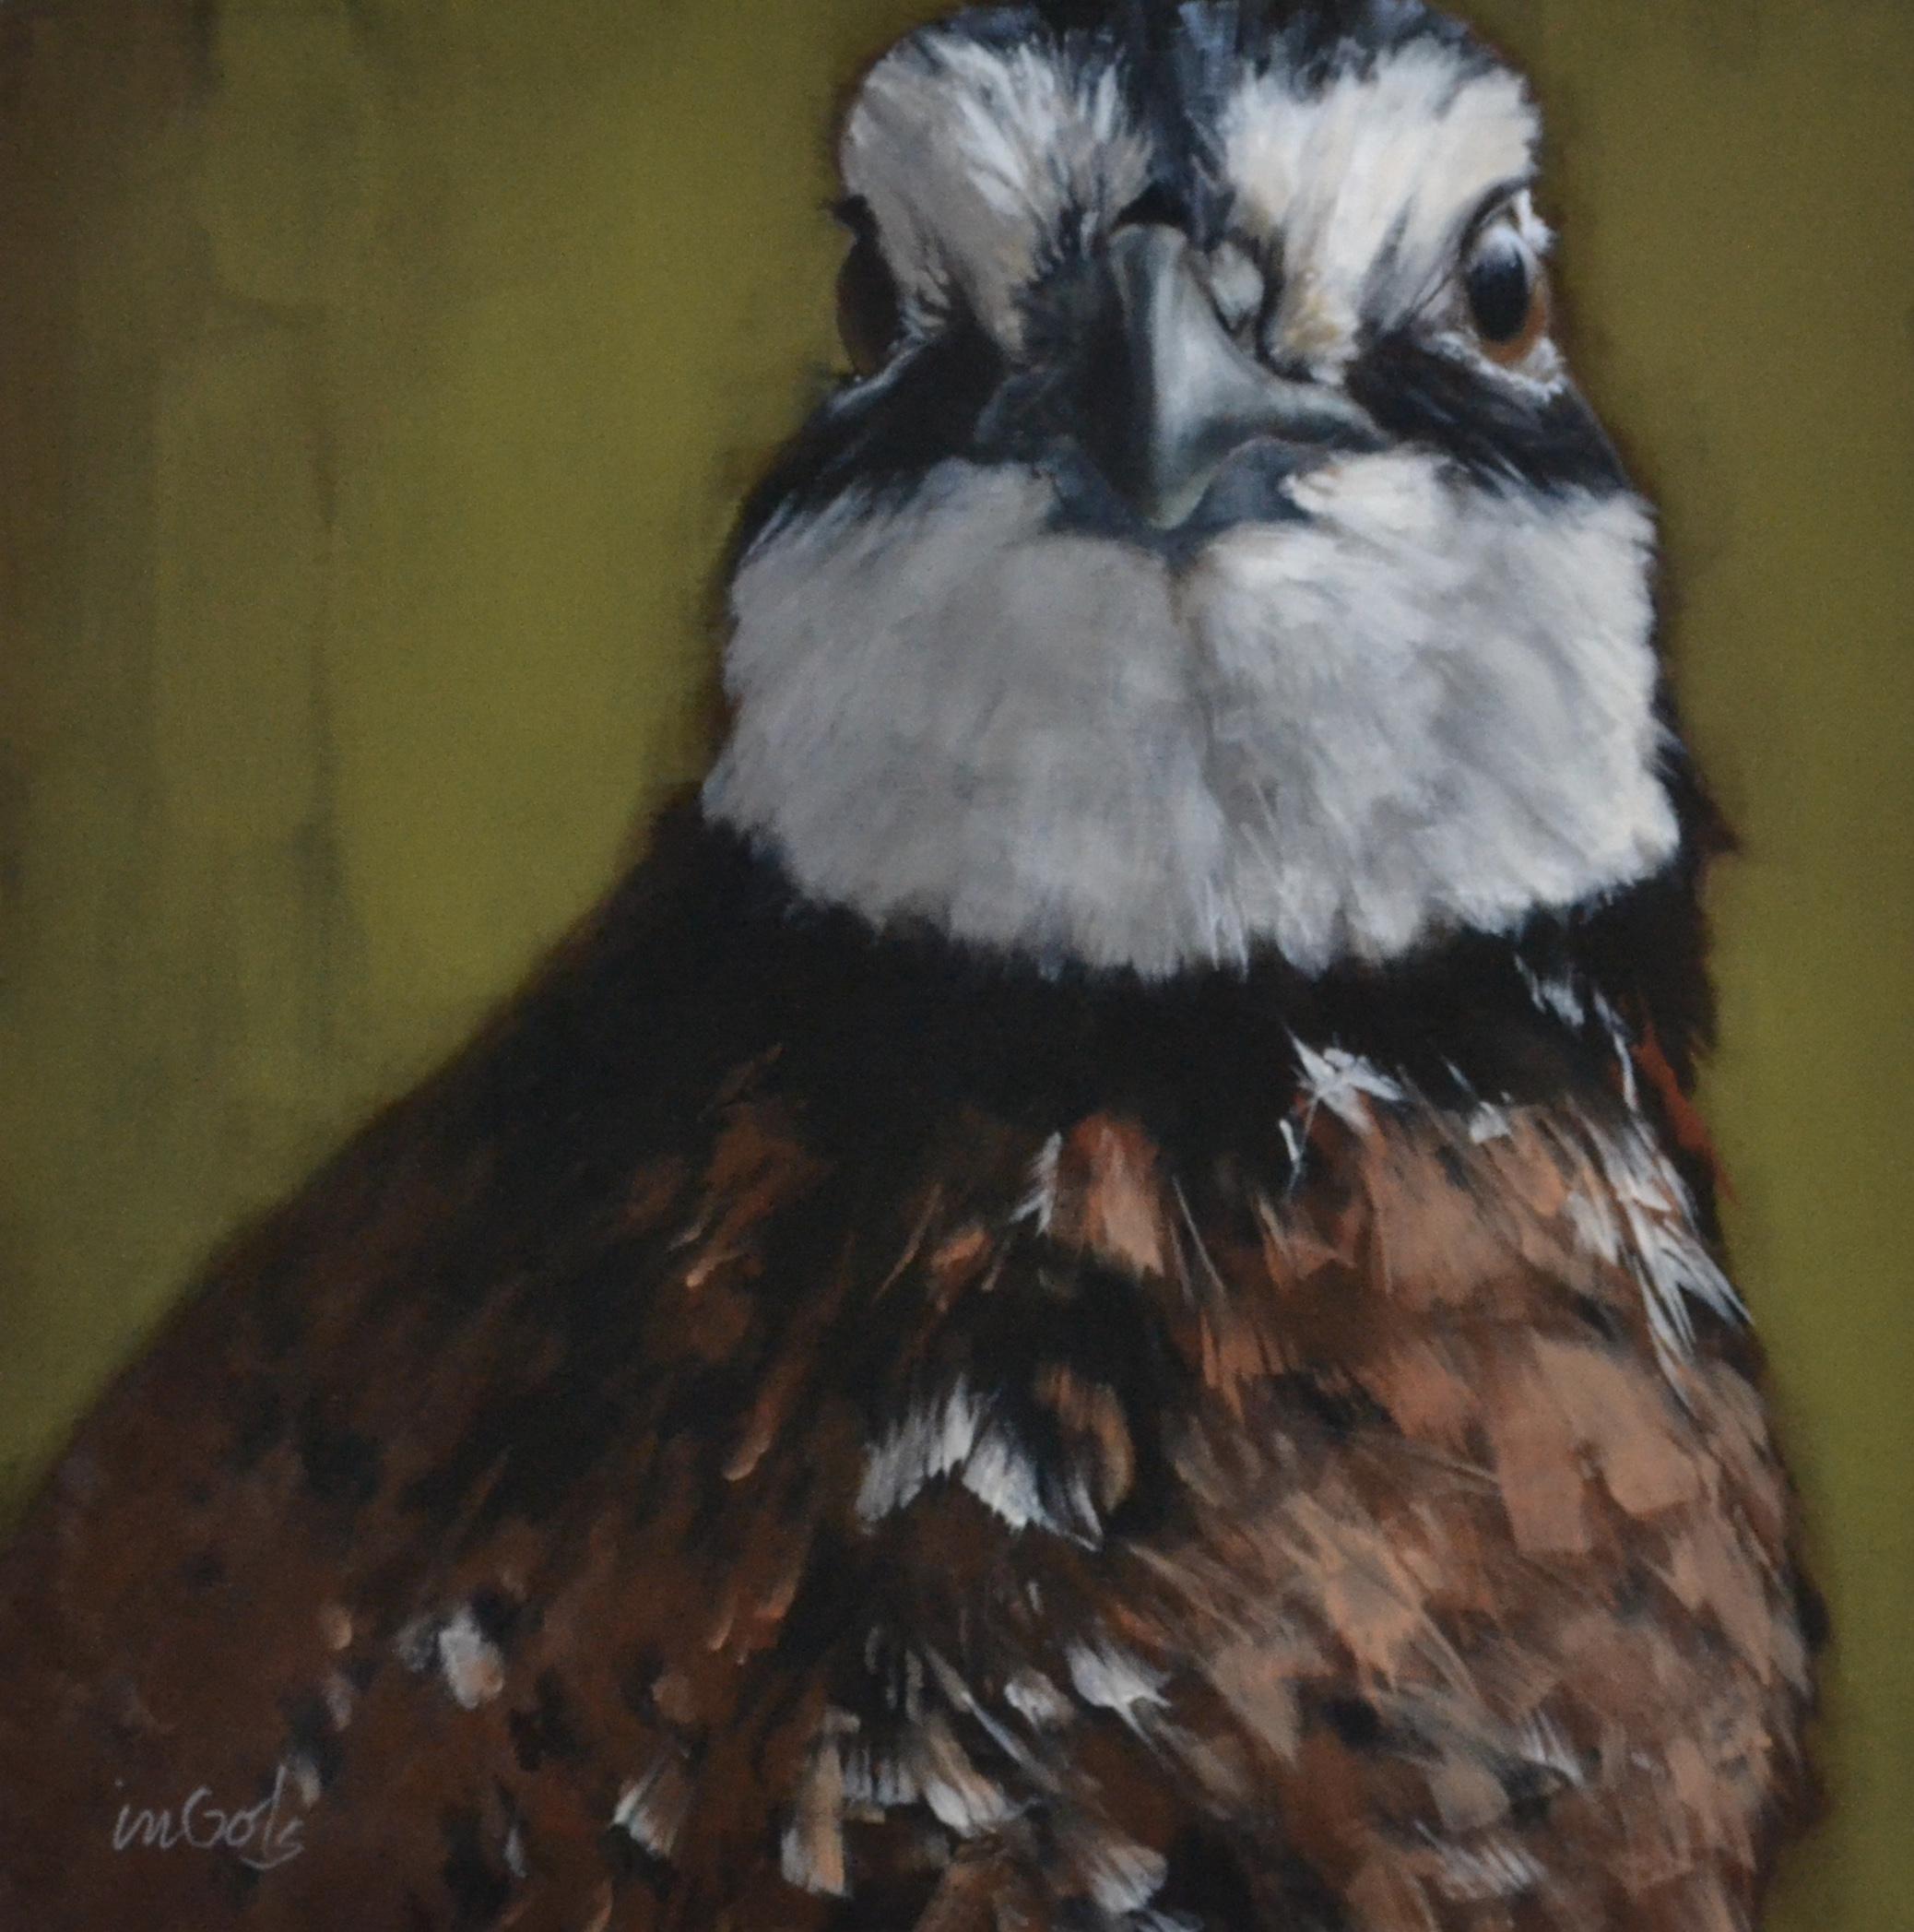 Jane Ingols Art, 18x18